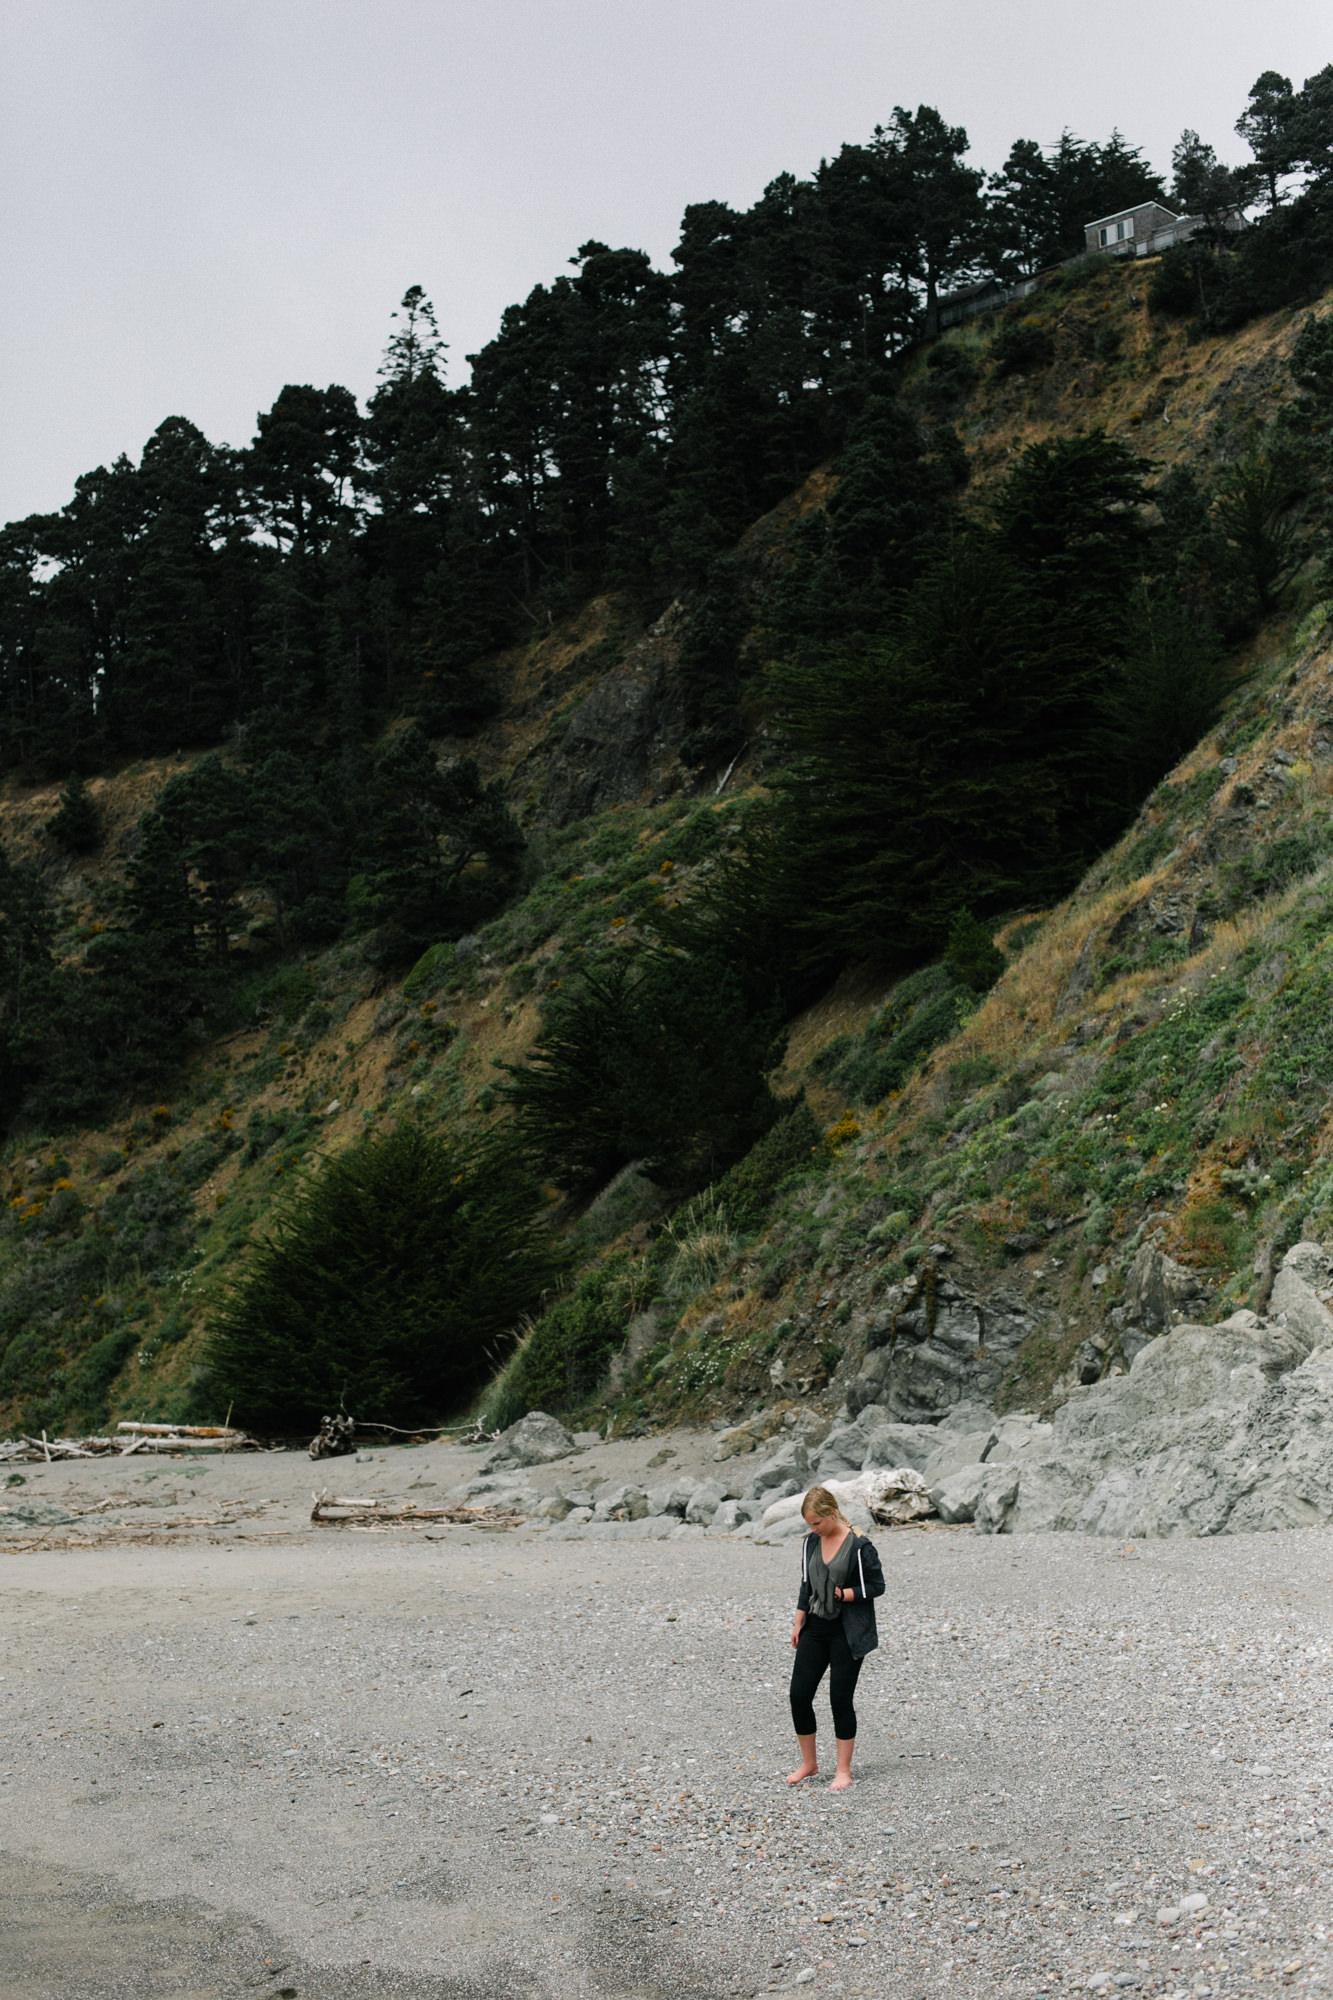 pacific_coast_road_trip-52.jpg